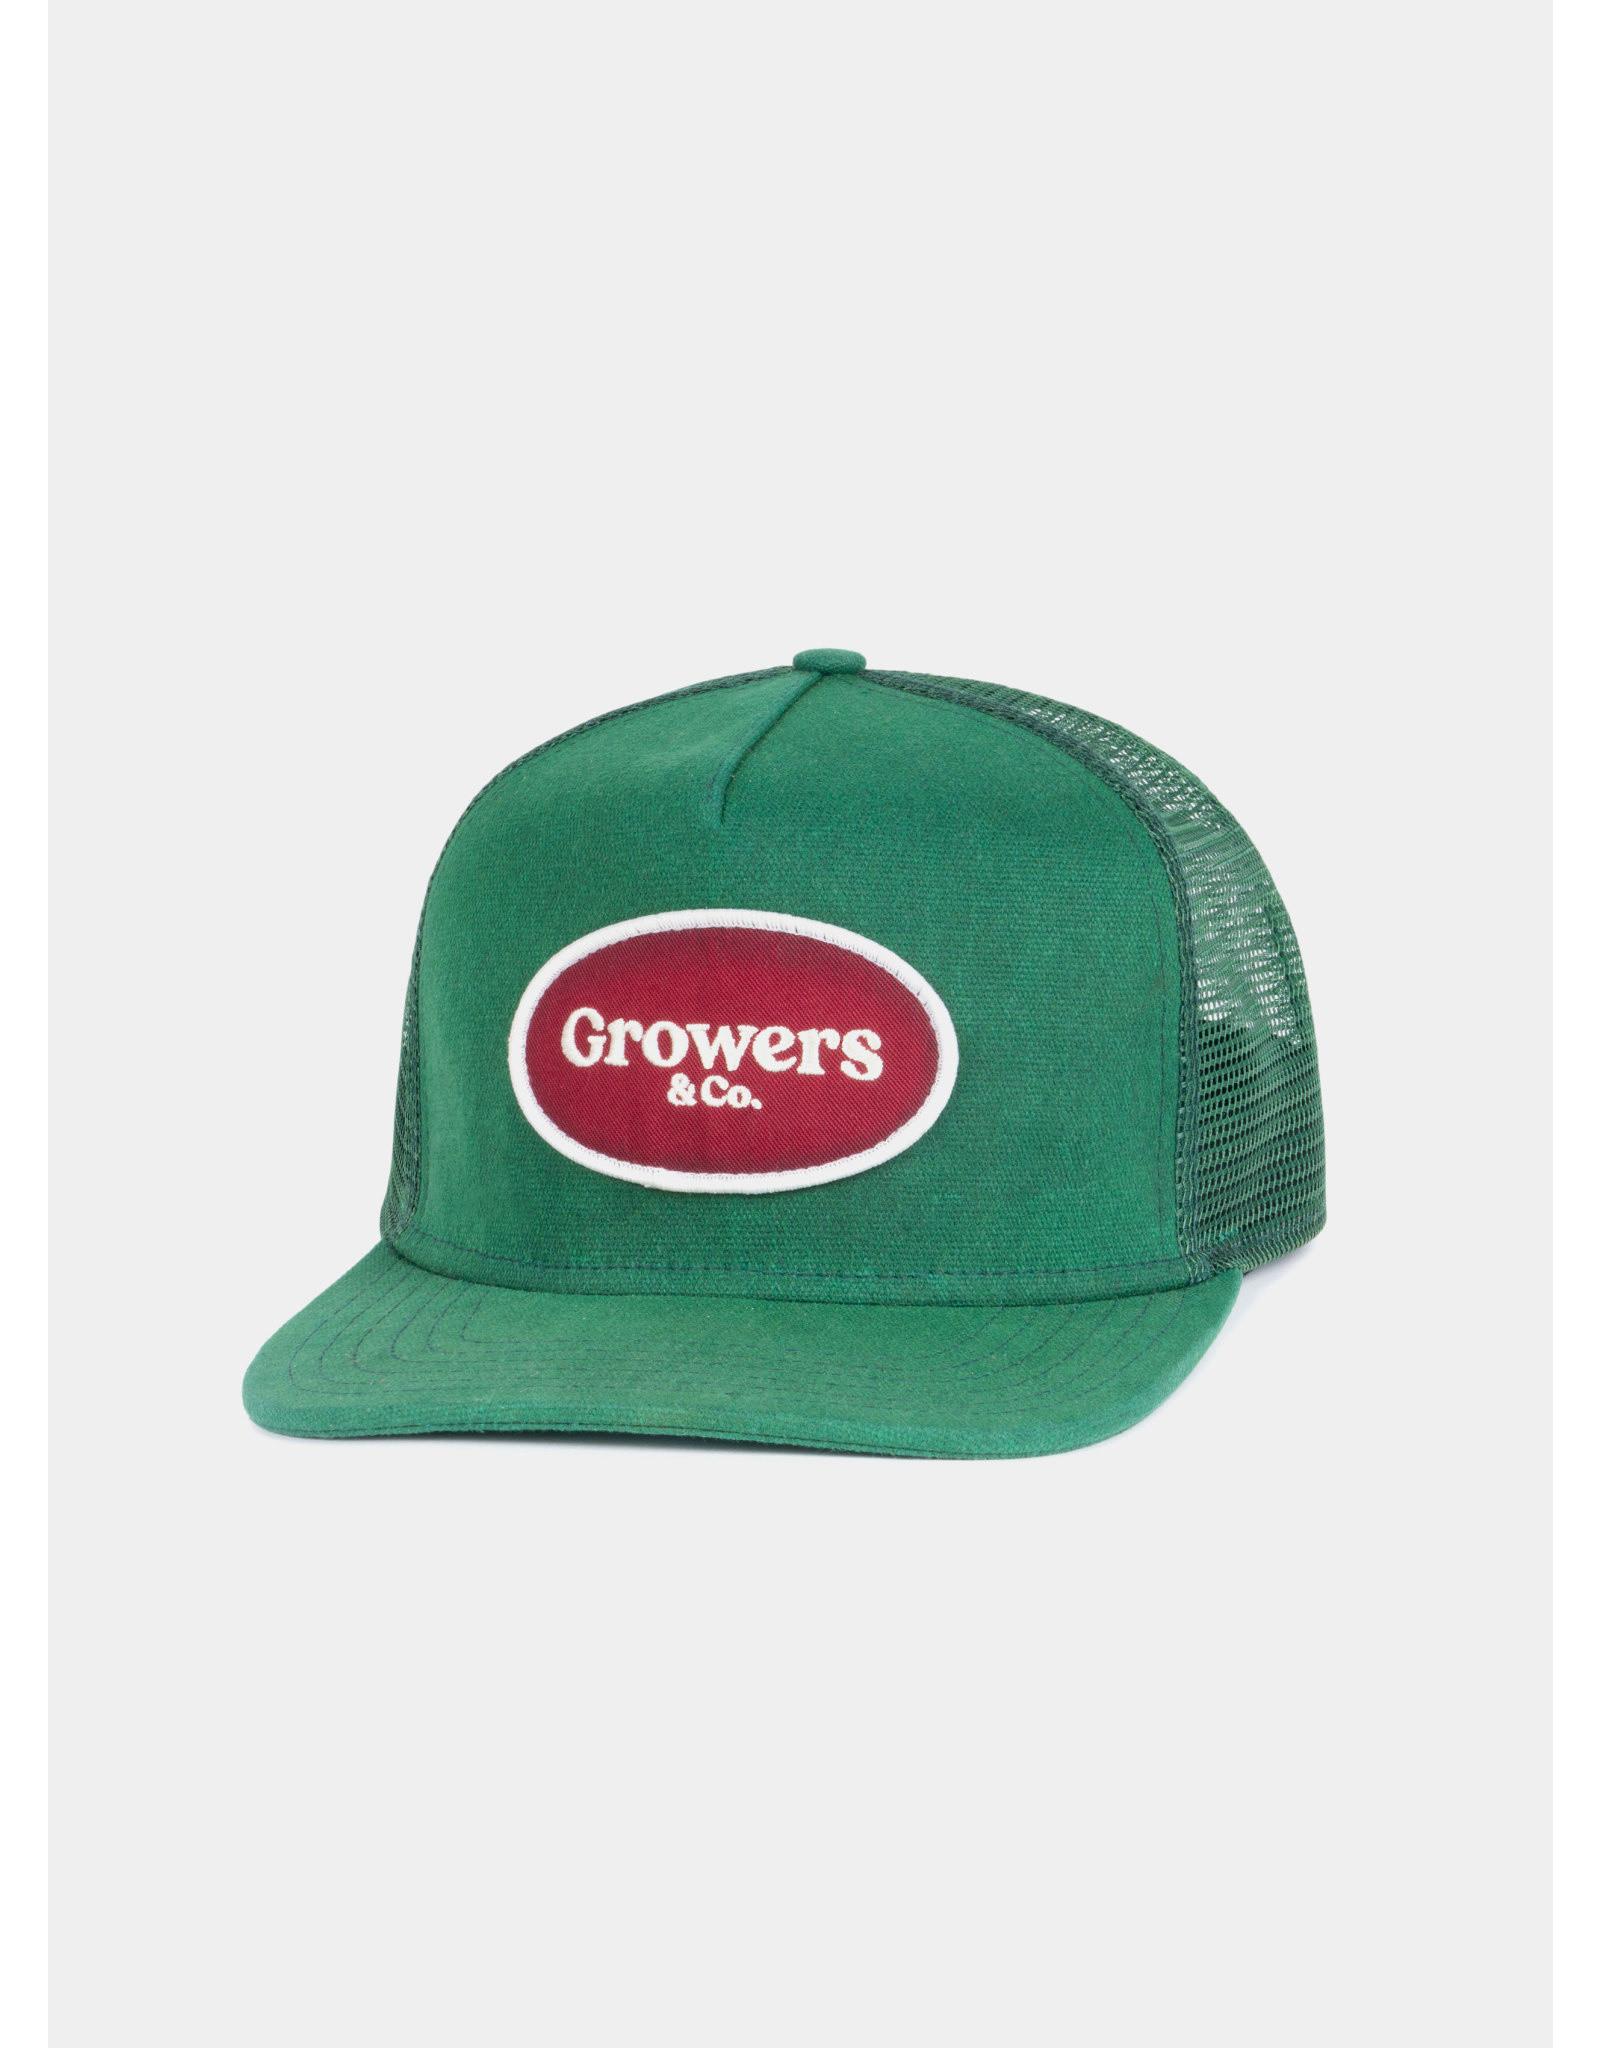 Growers&co Roma trucker hat